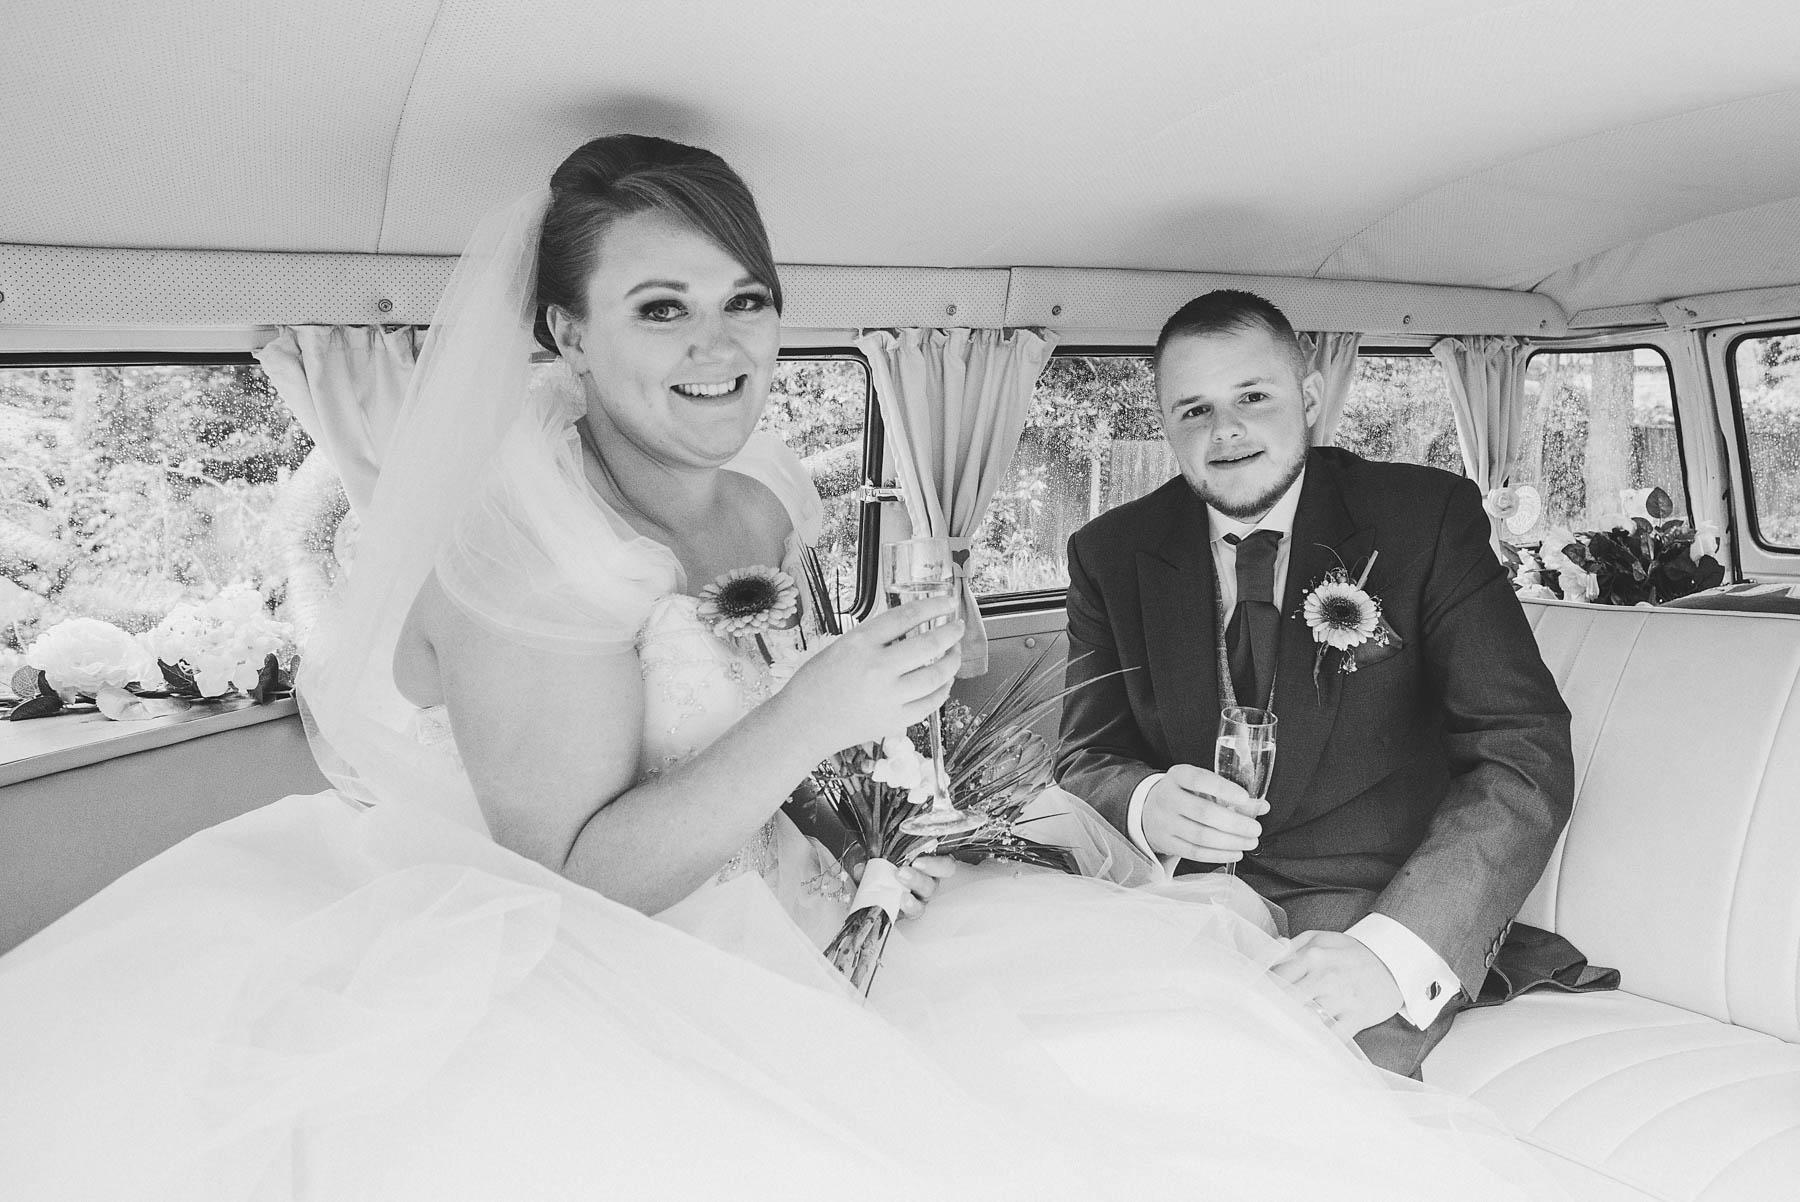 Bride and groom pose with drinks inside wedding campervan